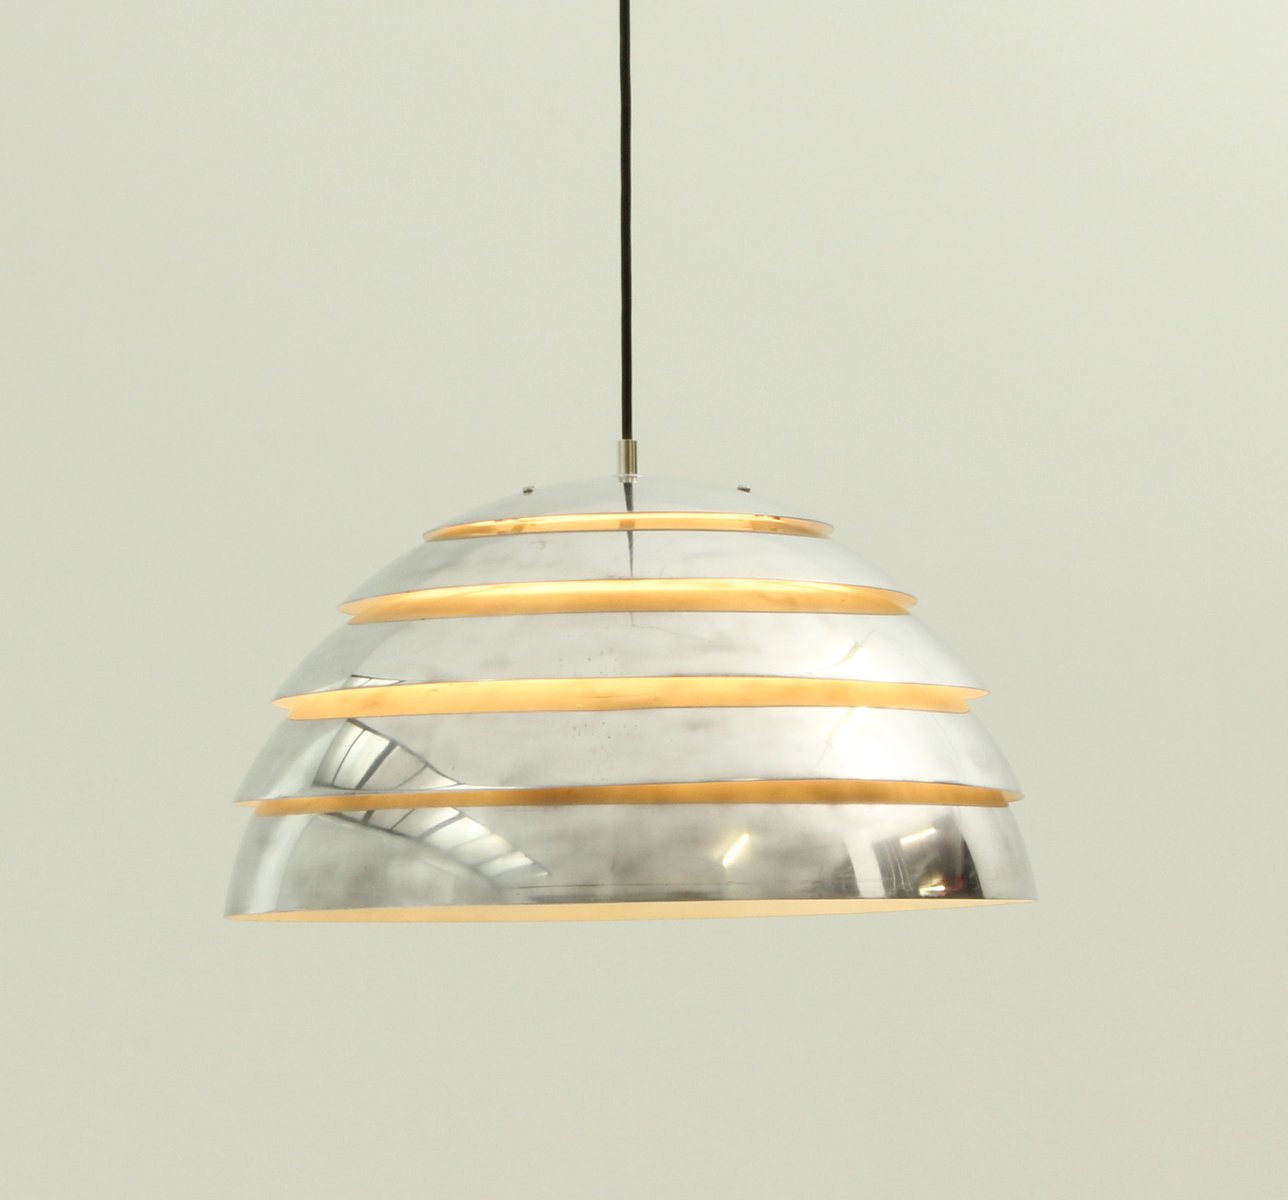 dome pendant lamp by hans agne jakobsson for markaryd. Black Bedroom Furniture Sets. Home Design Ideas